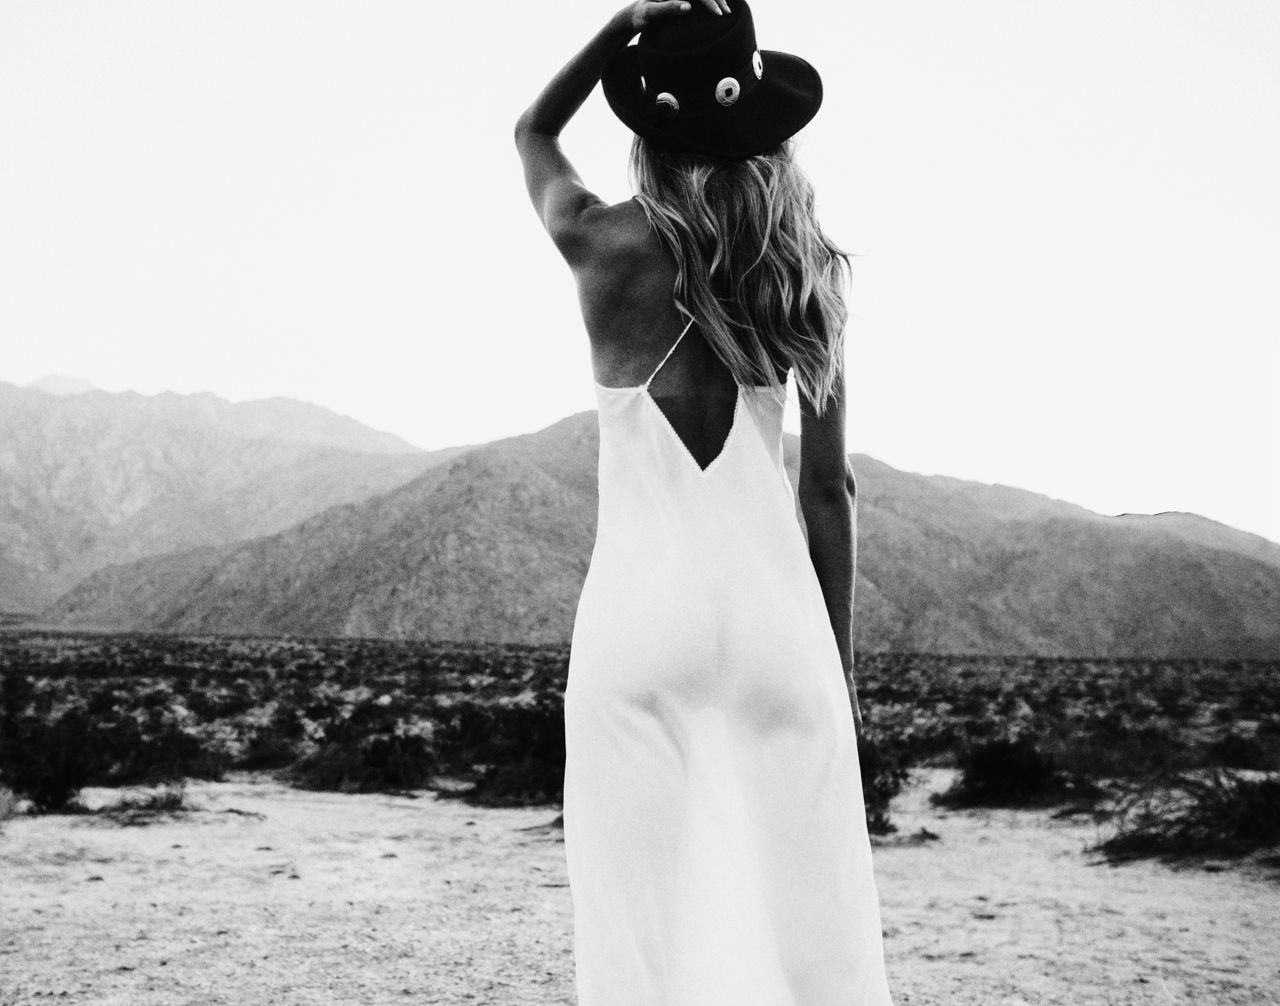 kesler tran photography- Inspiration for editing